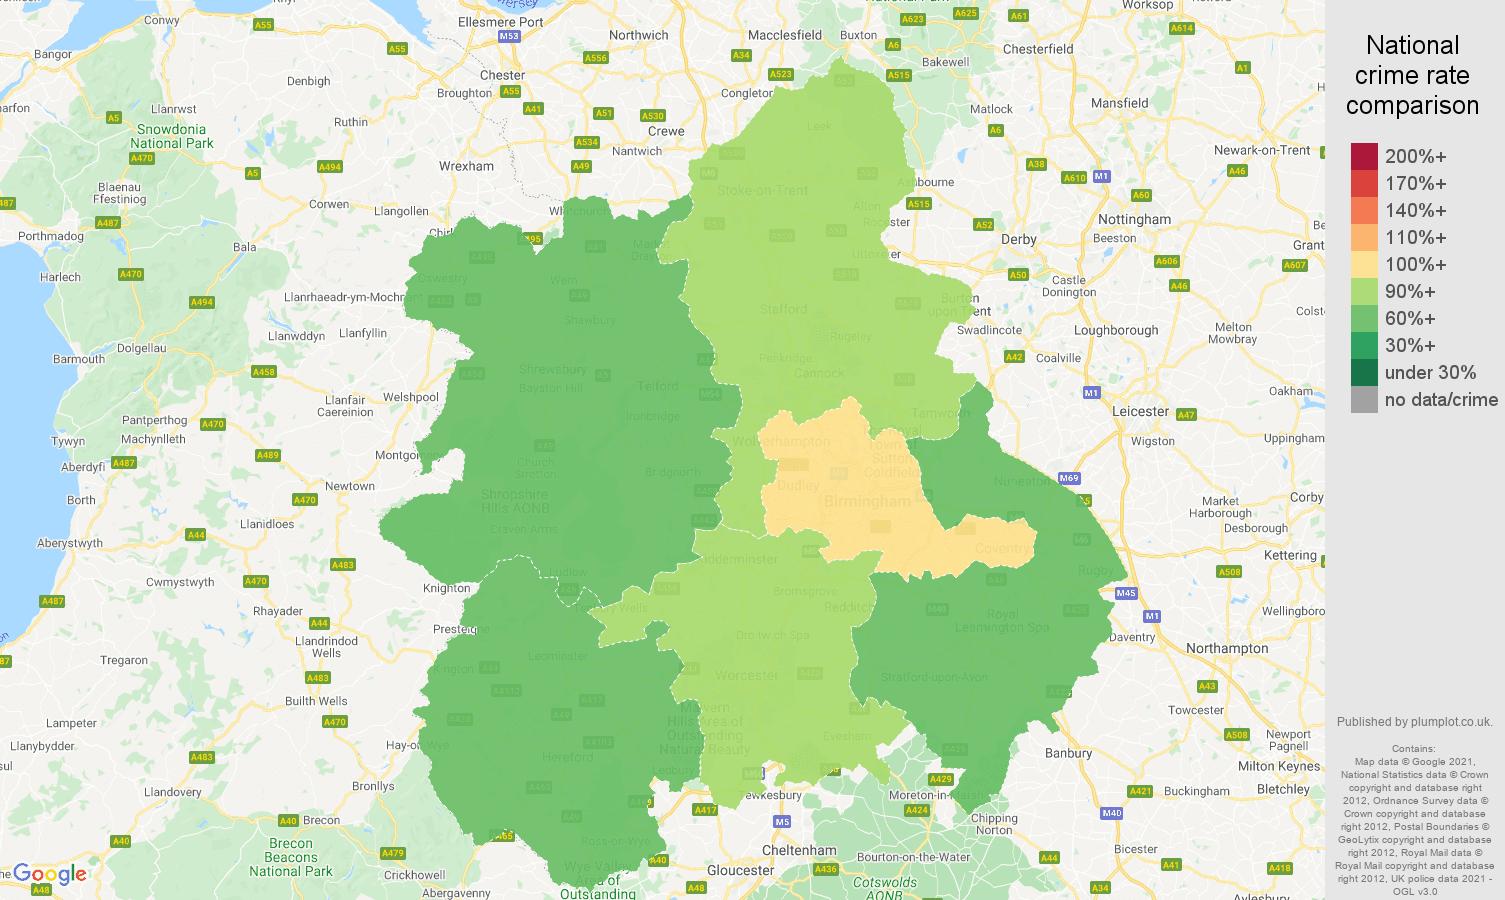 West Midlands criminal damage and arson crime rate comparison map